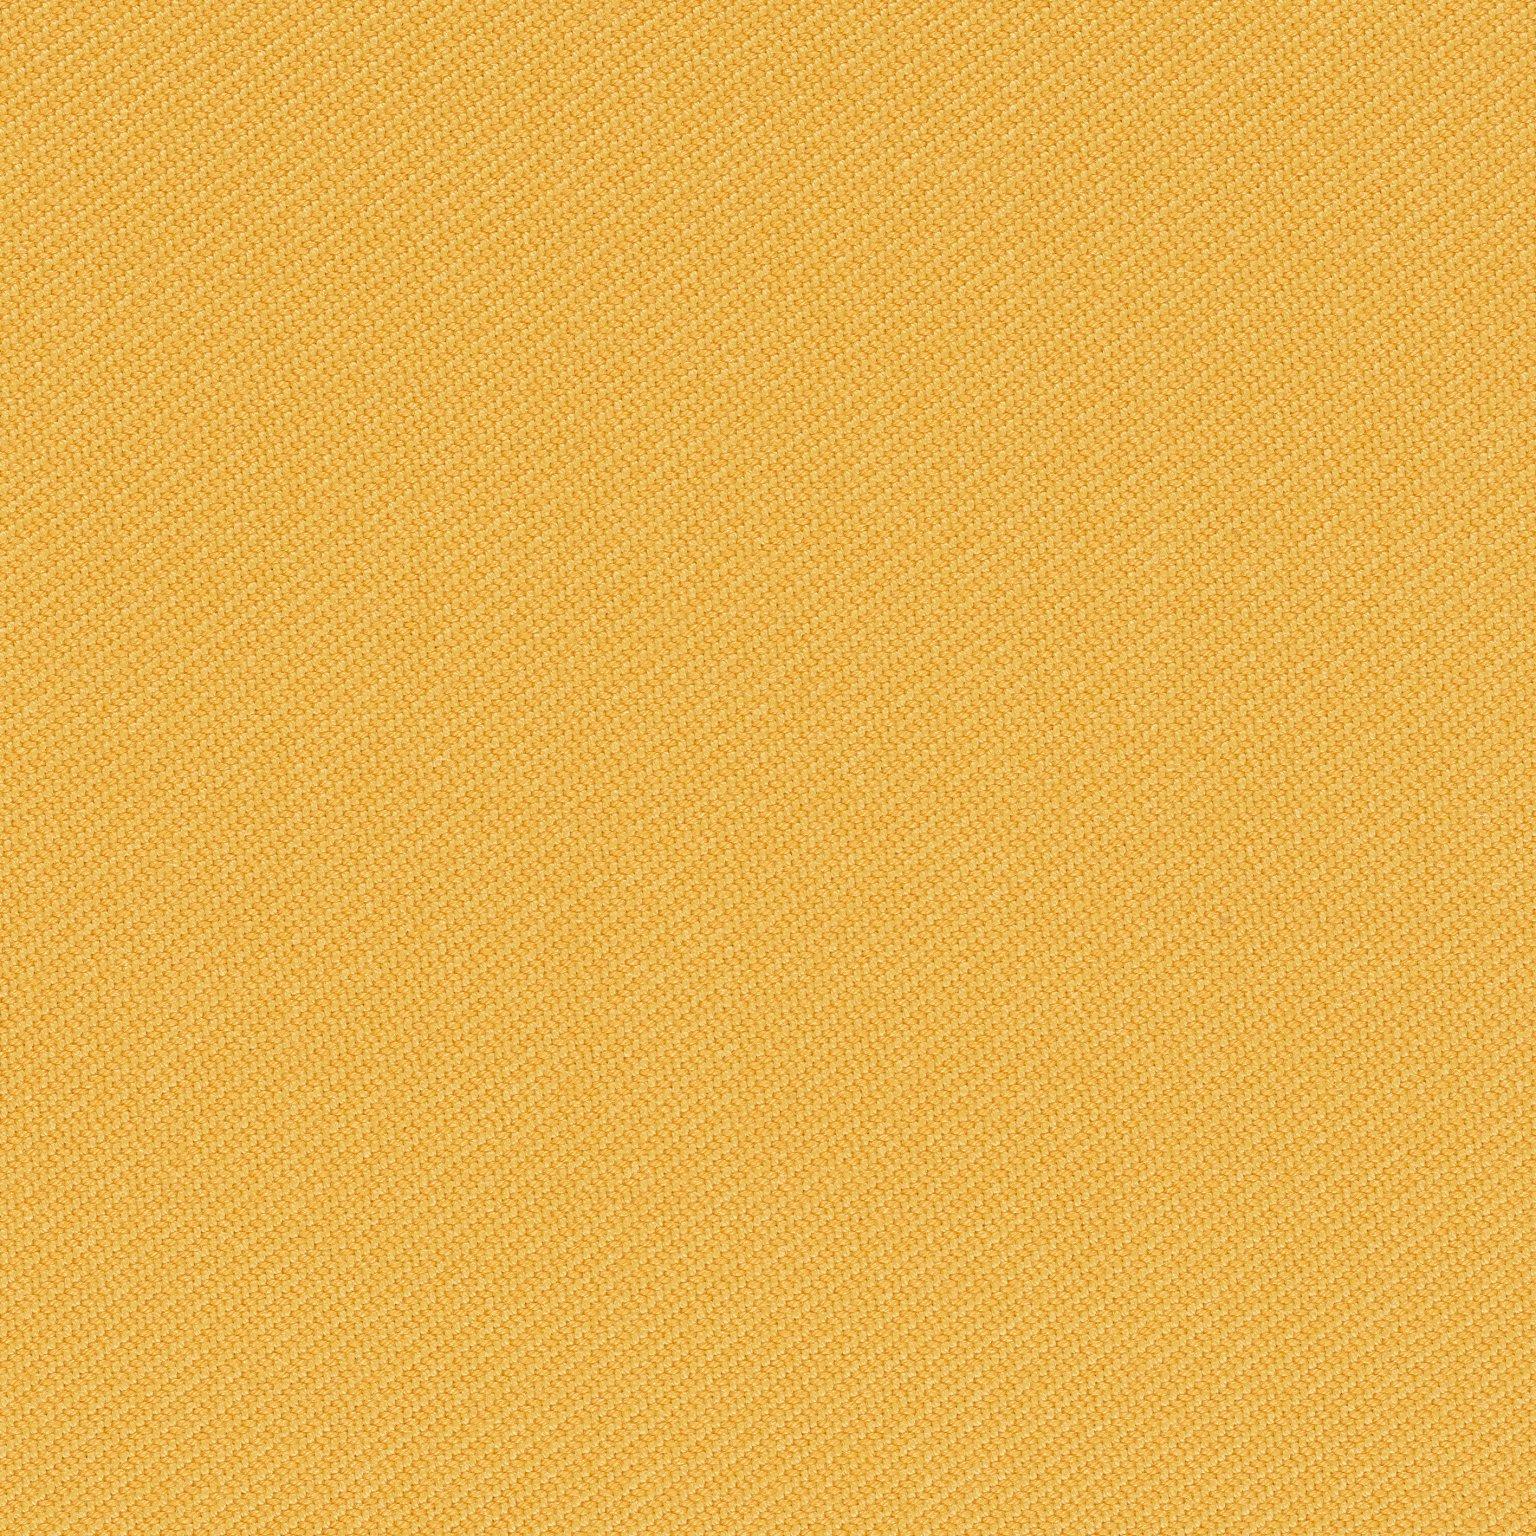 Kvadrat > Twill Weave 0440